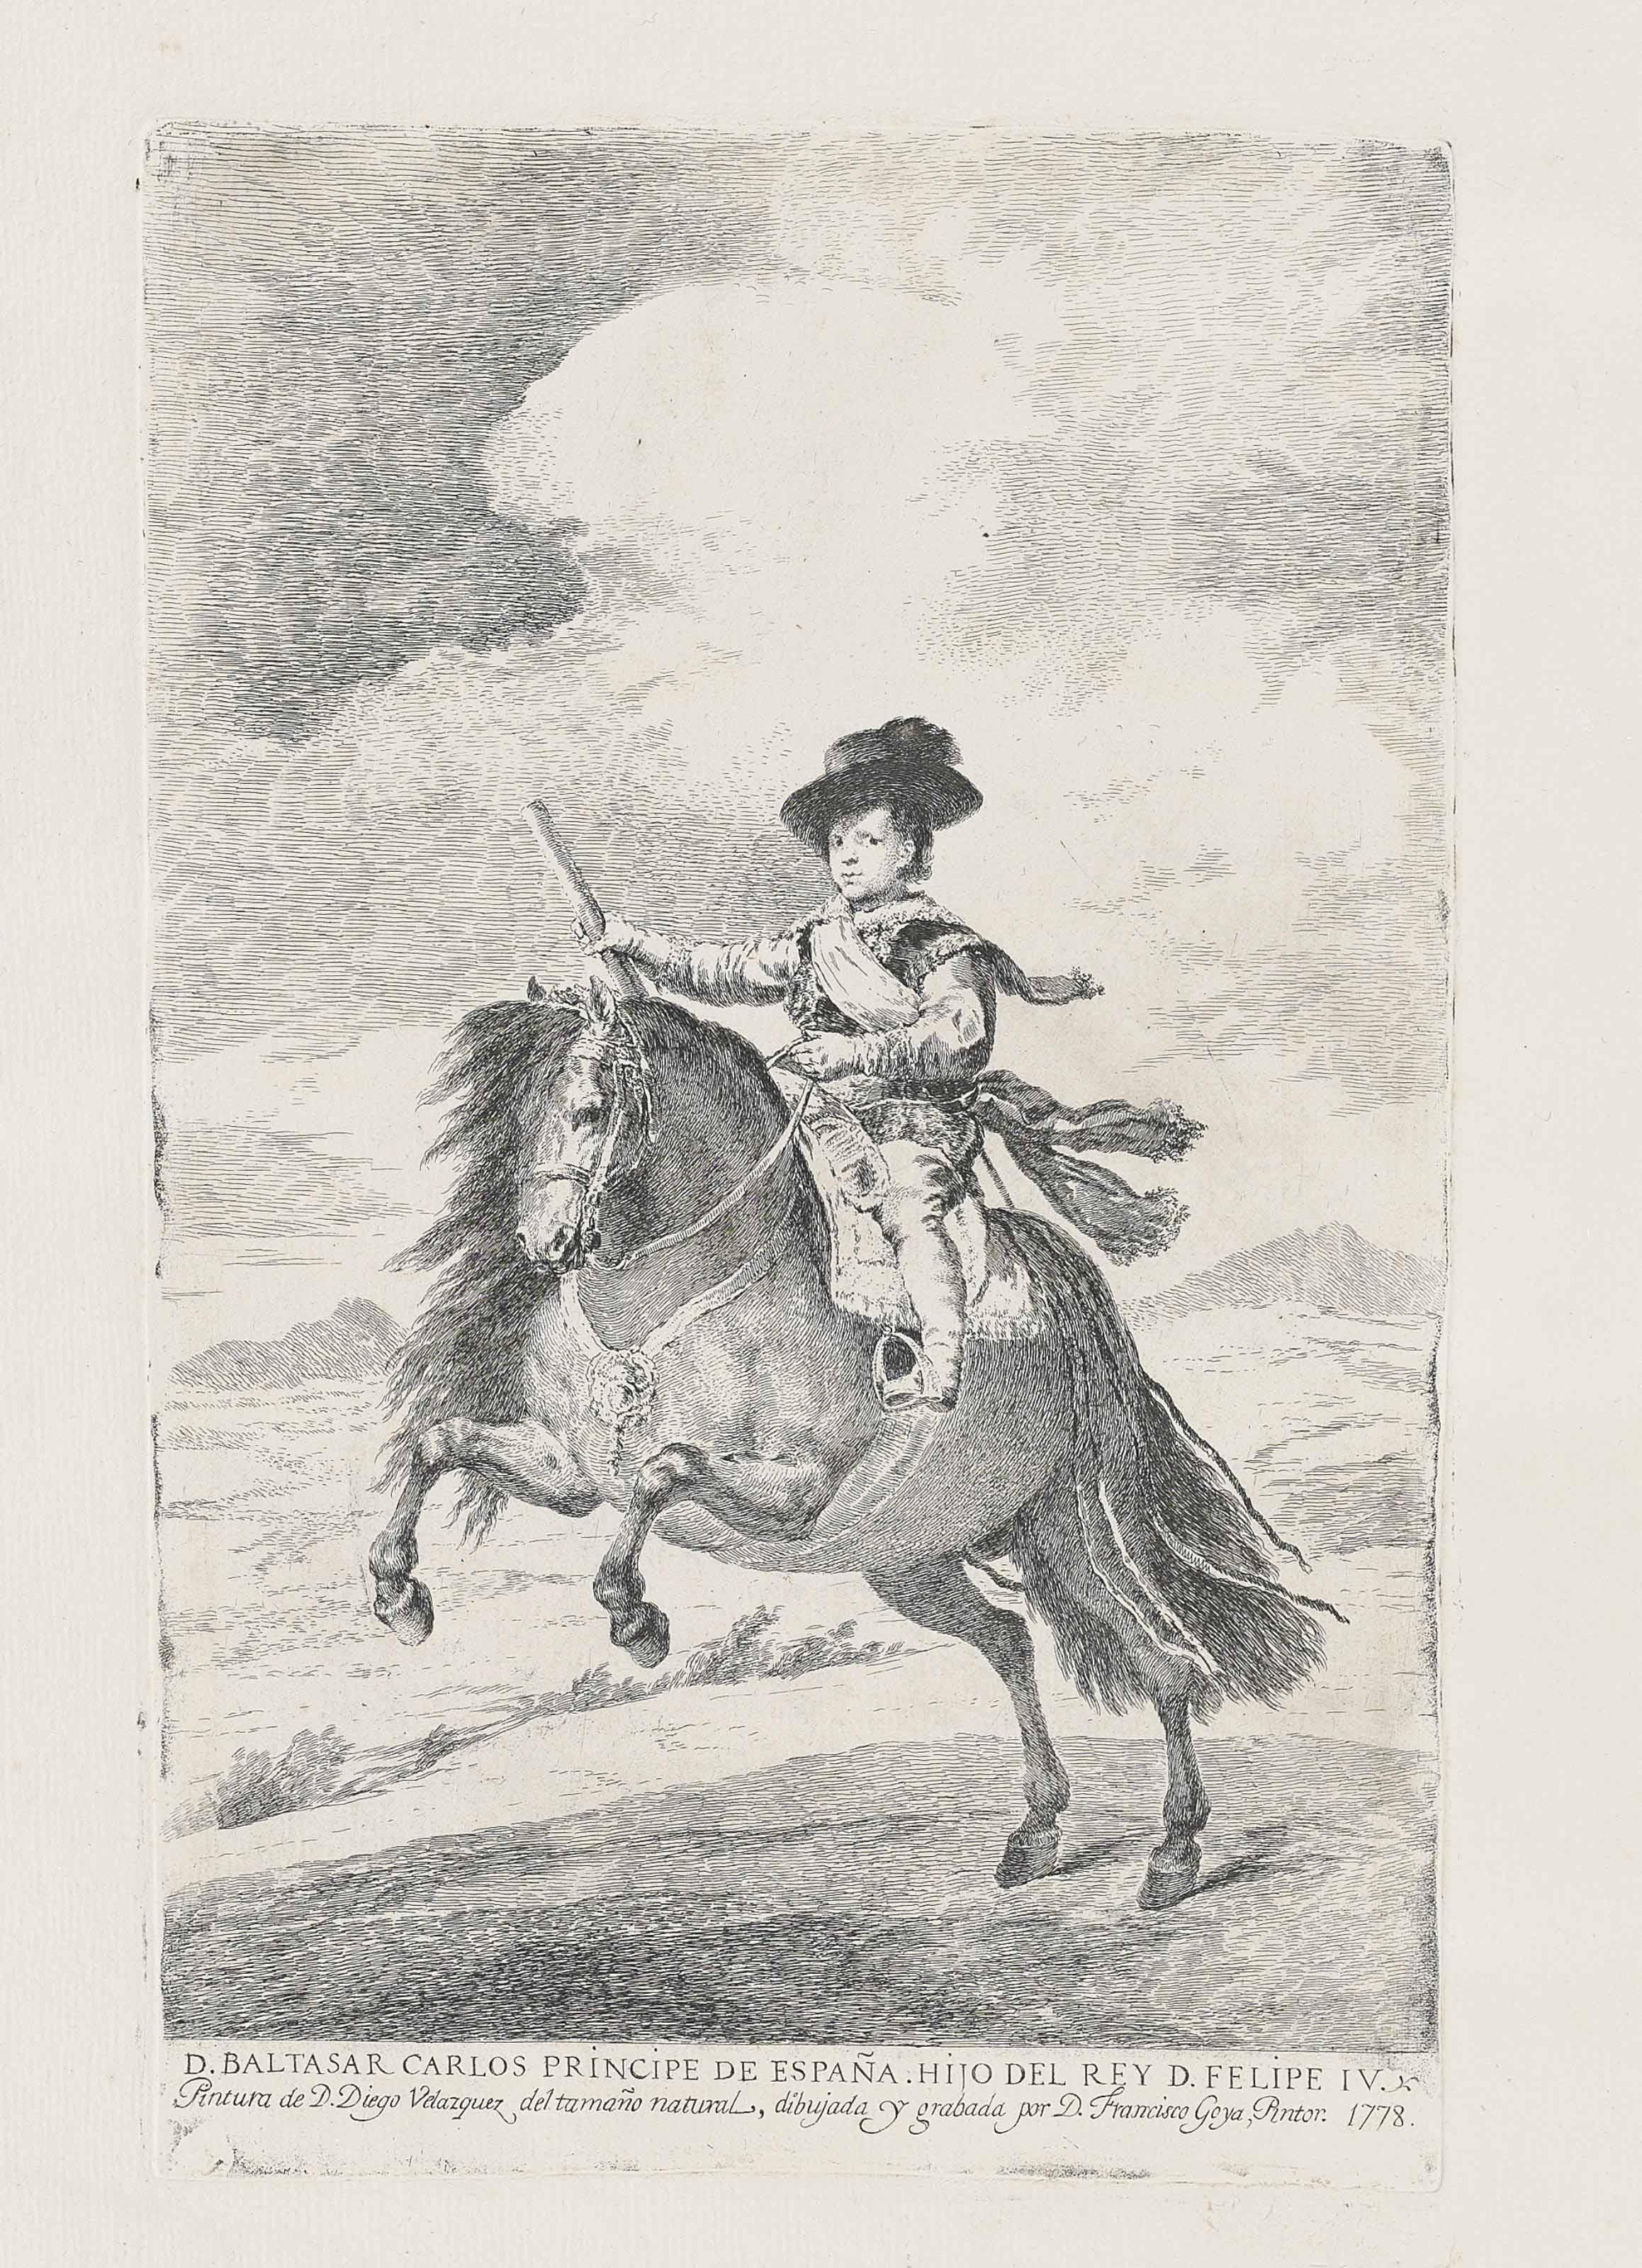 Francisco de Goya y Lucientes (1746-1828), after Diego Velázquez (1599-1660)